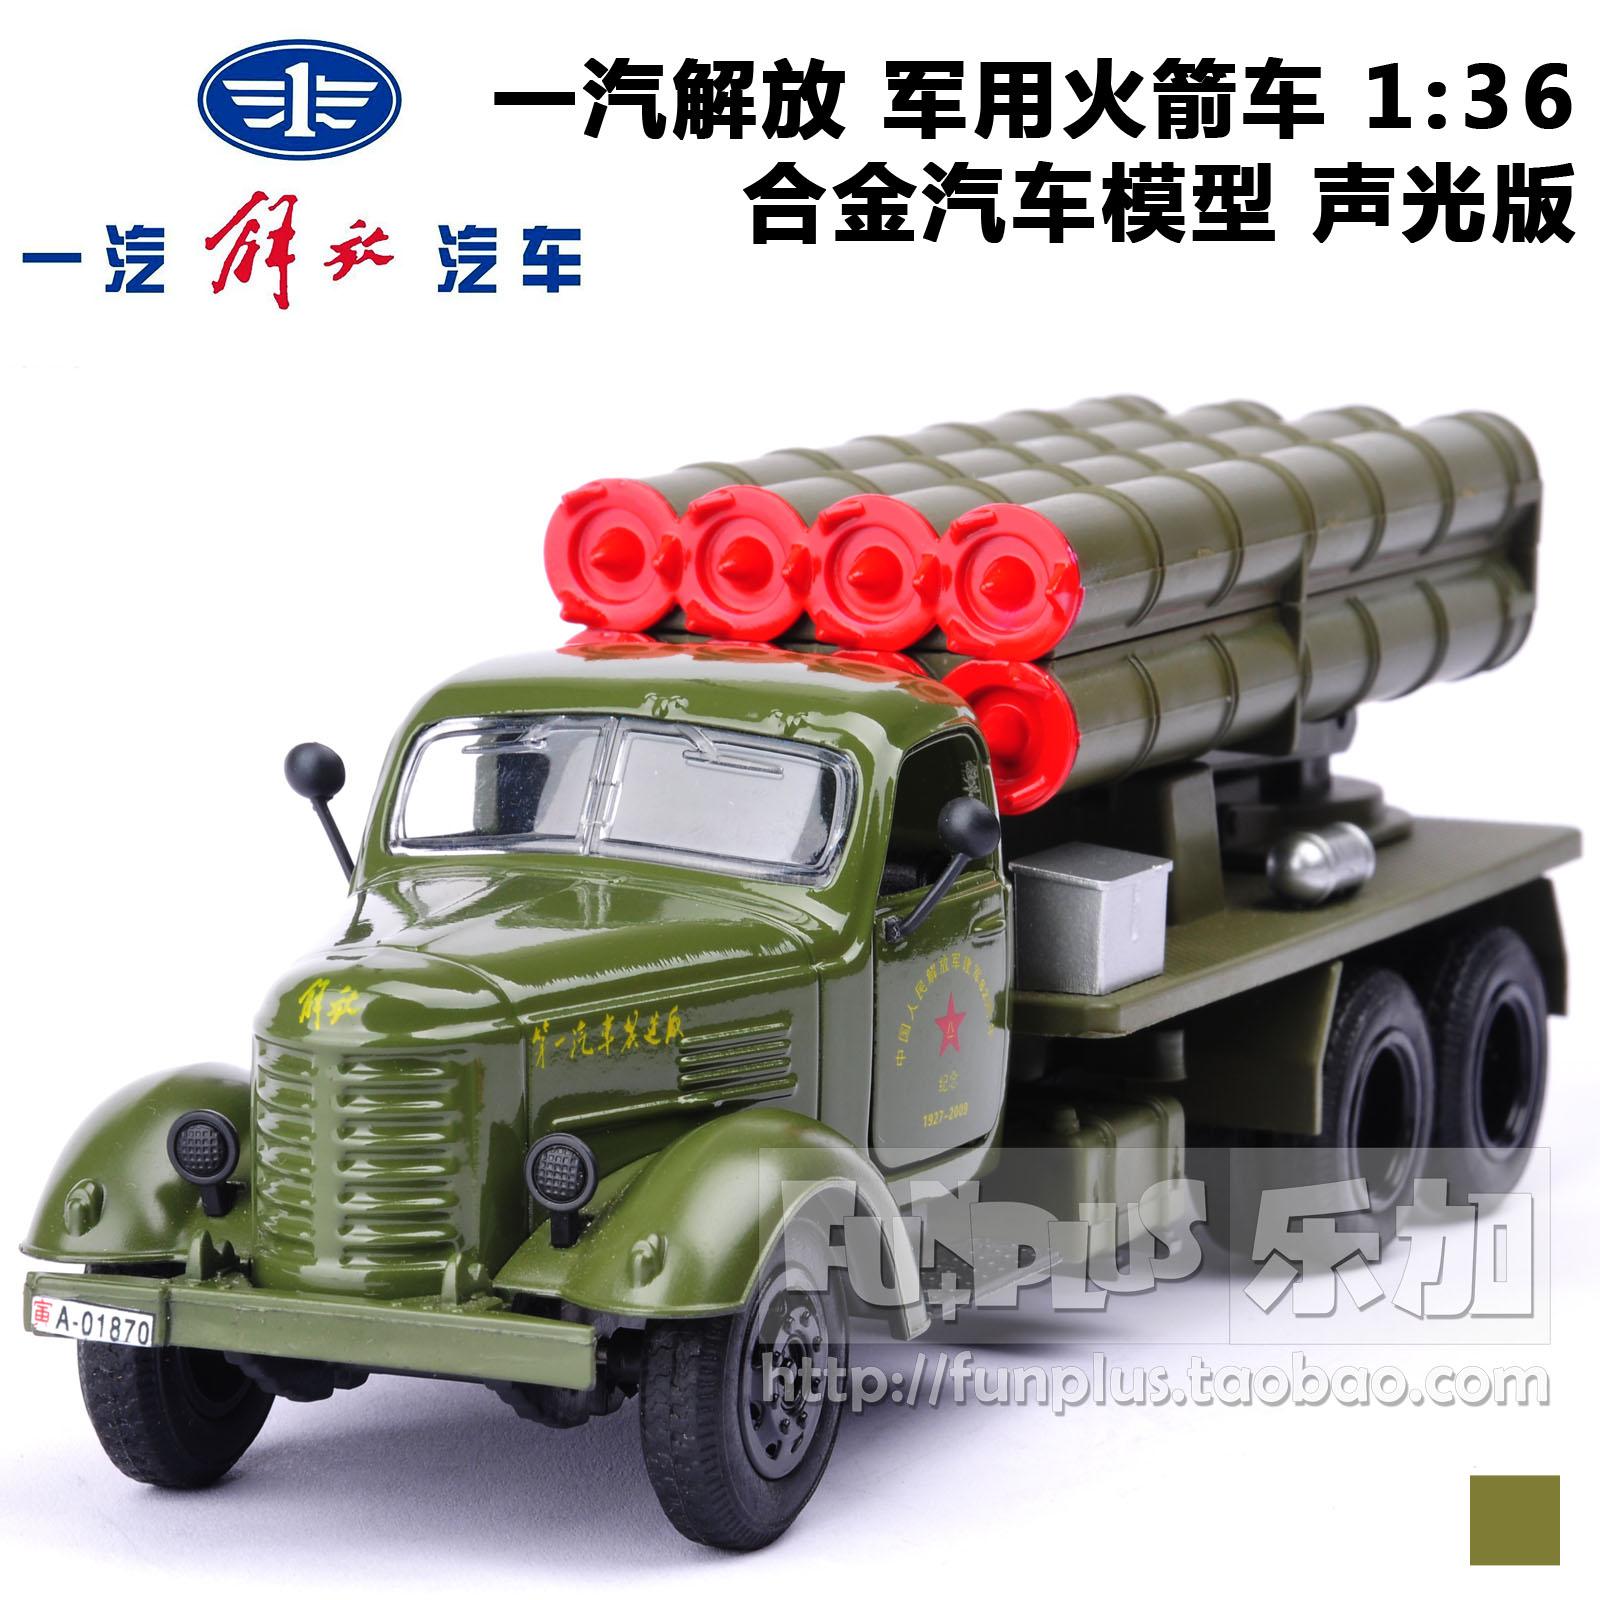 The old liberated military rocket car 1:36 alloy model car simulation acousto-optic toy vehicle back(China (Mainland))